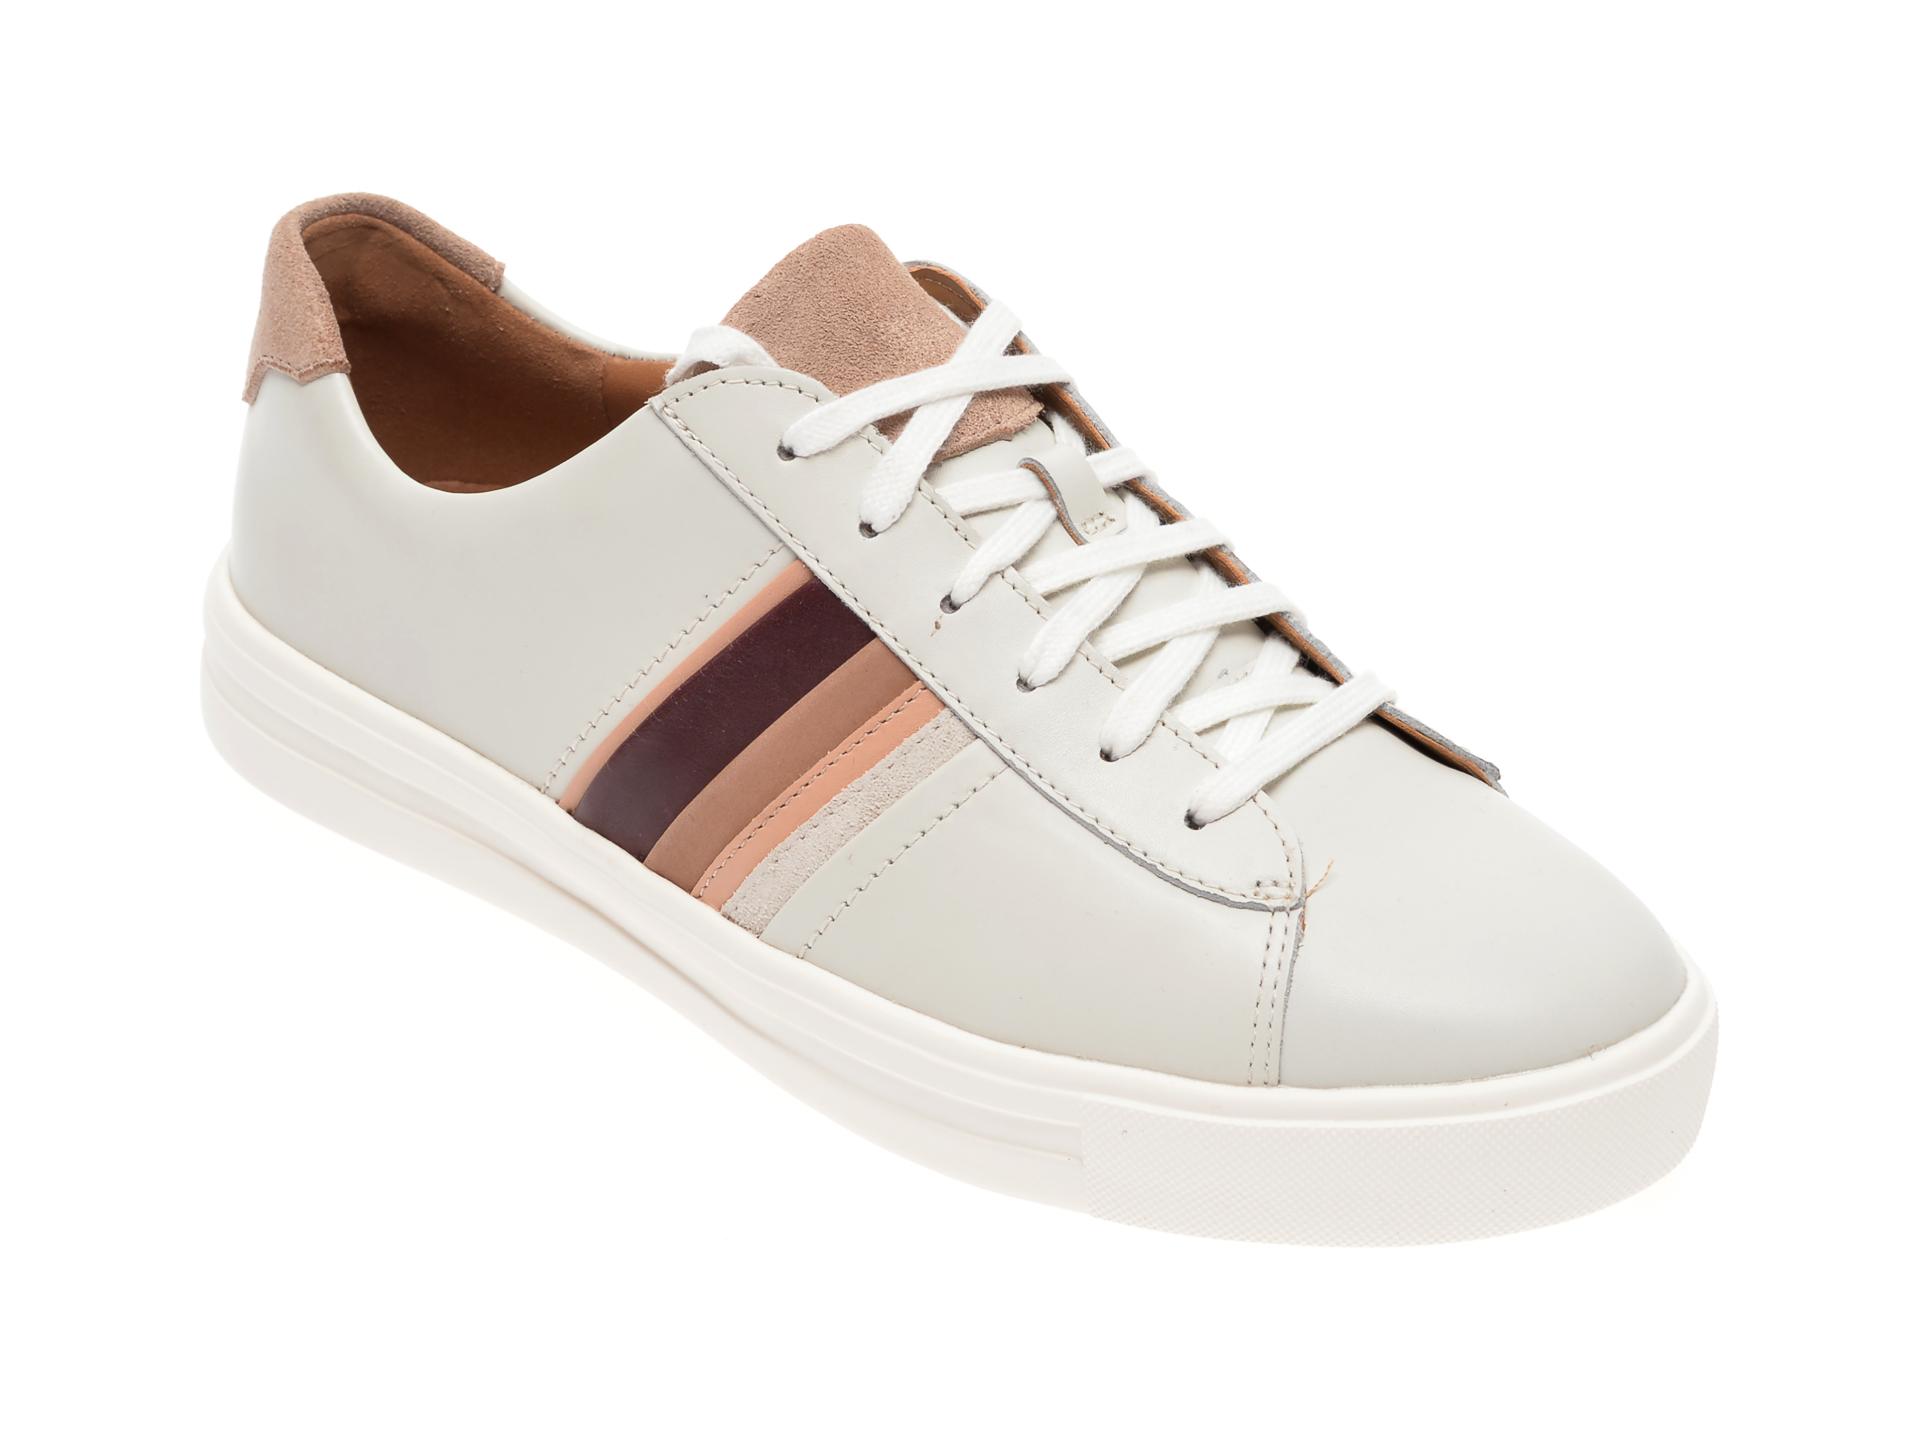 Pantofi CLARKS albi, Un Maui Band, din piele naturala